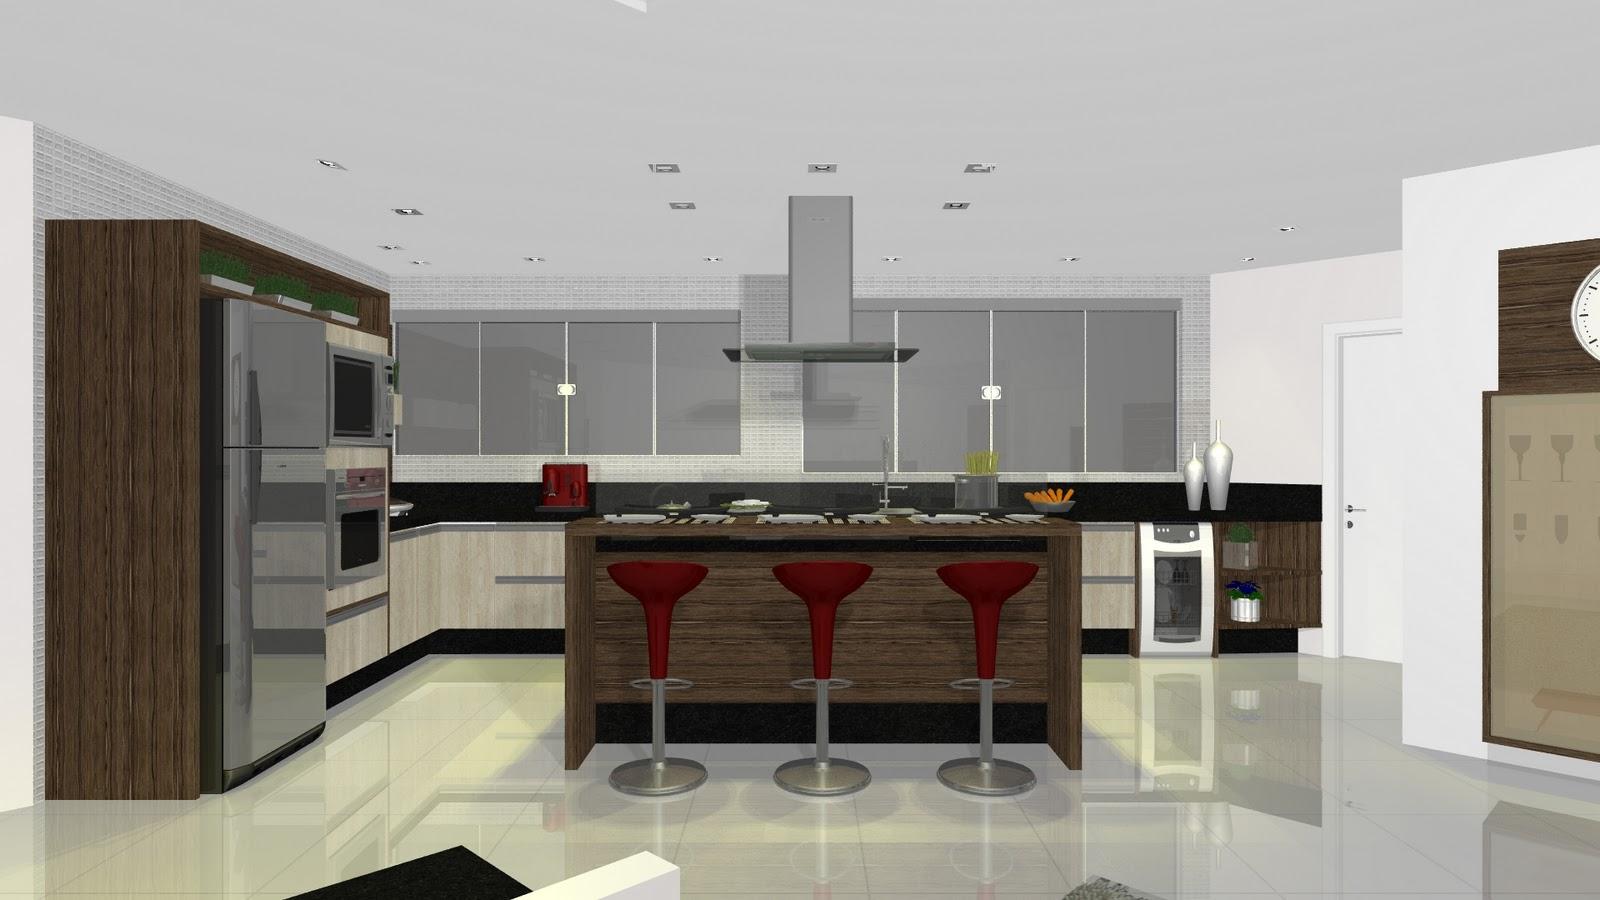 ensaios!!! Charles Chaplin: Projeto BENTEC Cozinha x Sala de Jantar #382C21 1600 900